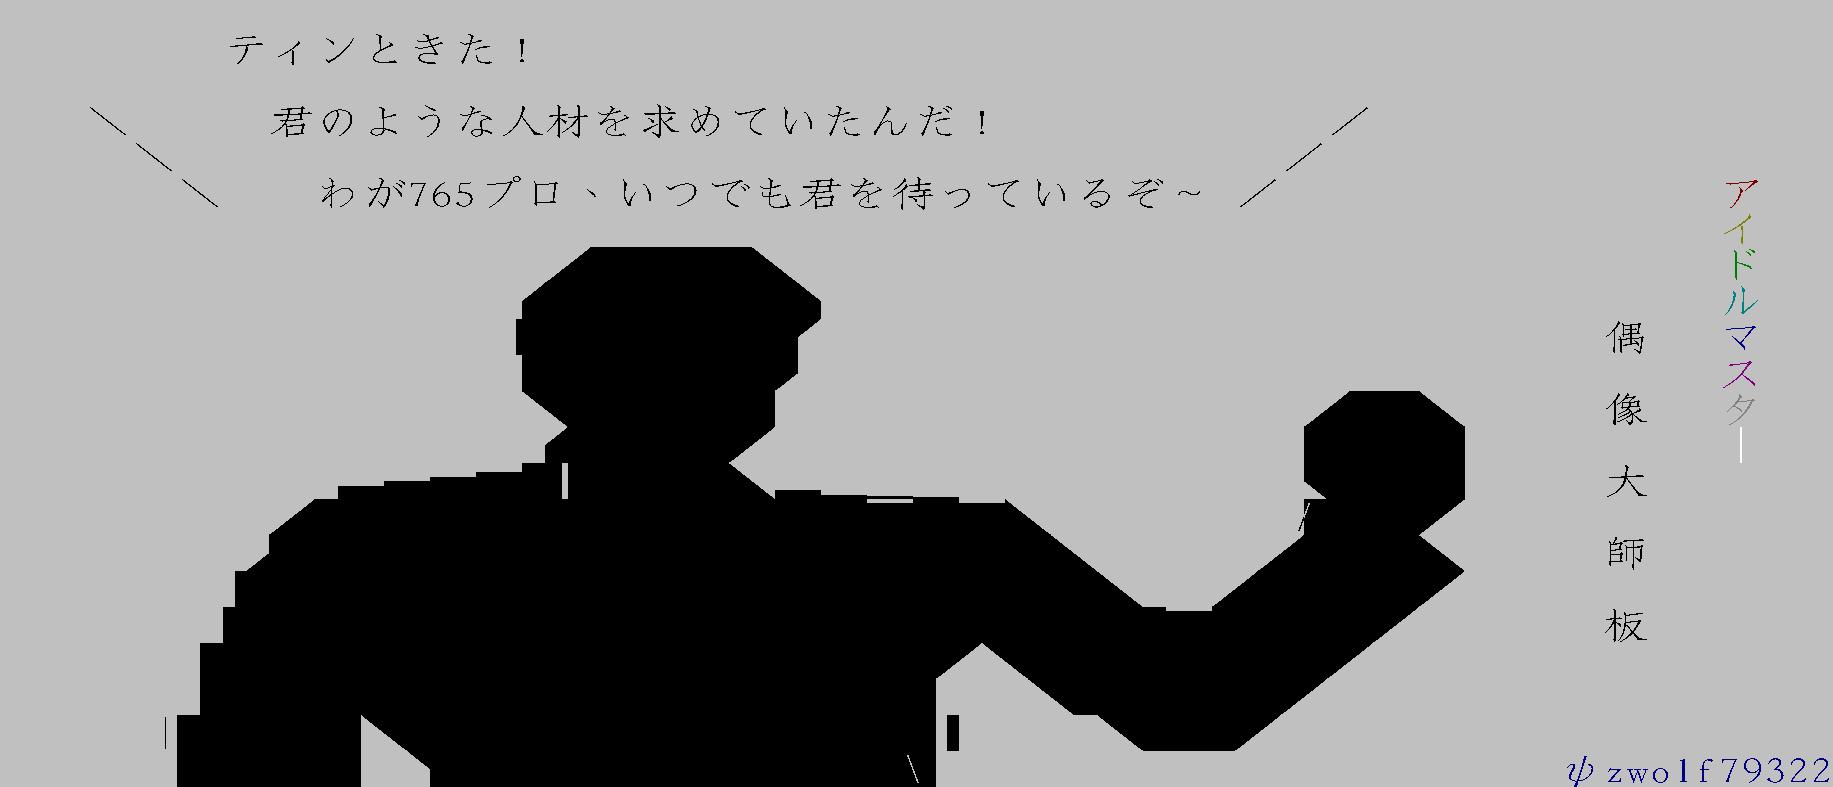 IdolMaster(偶像大師板)